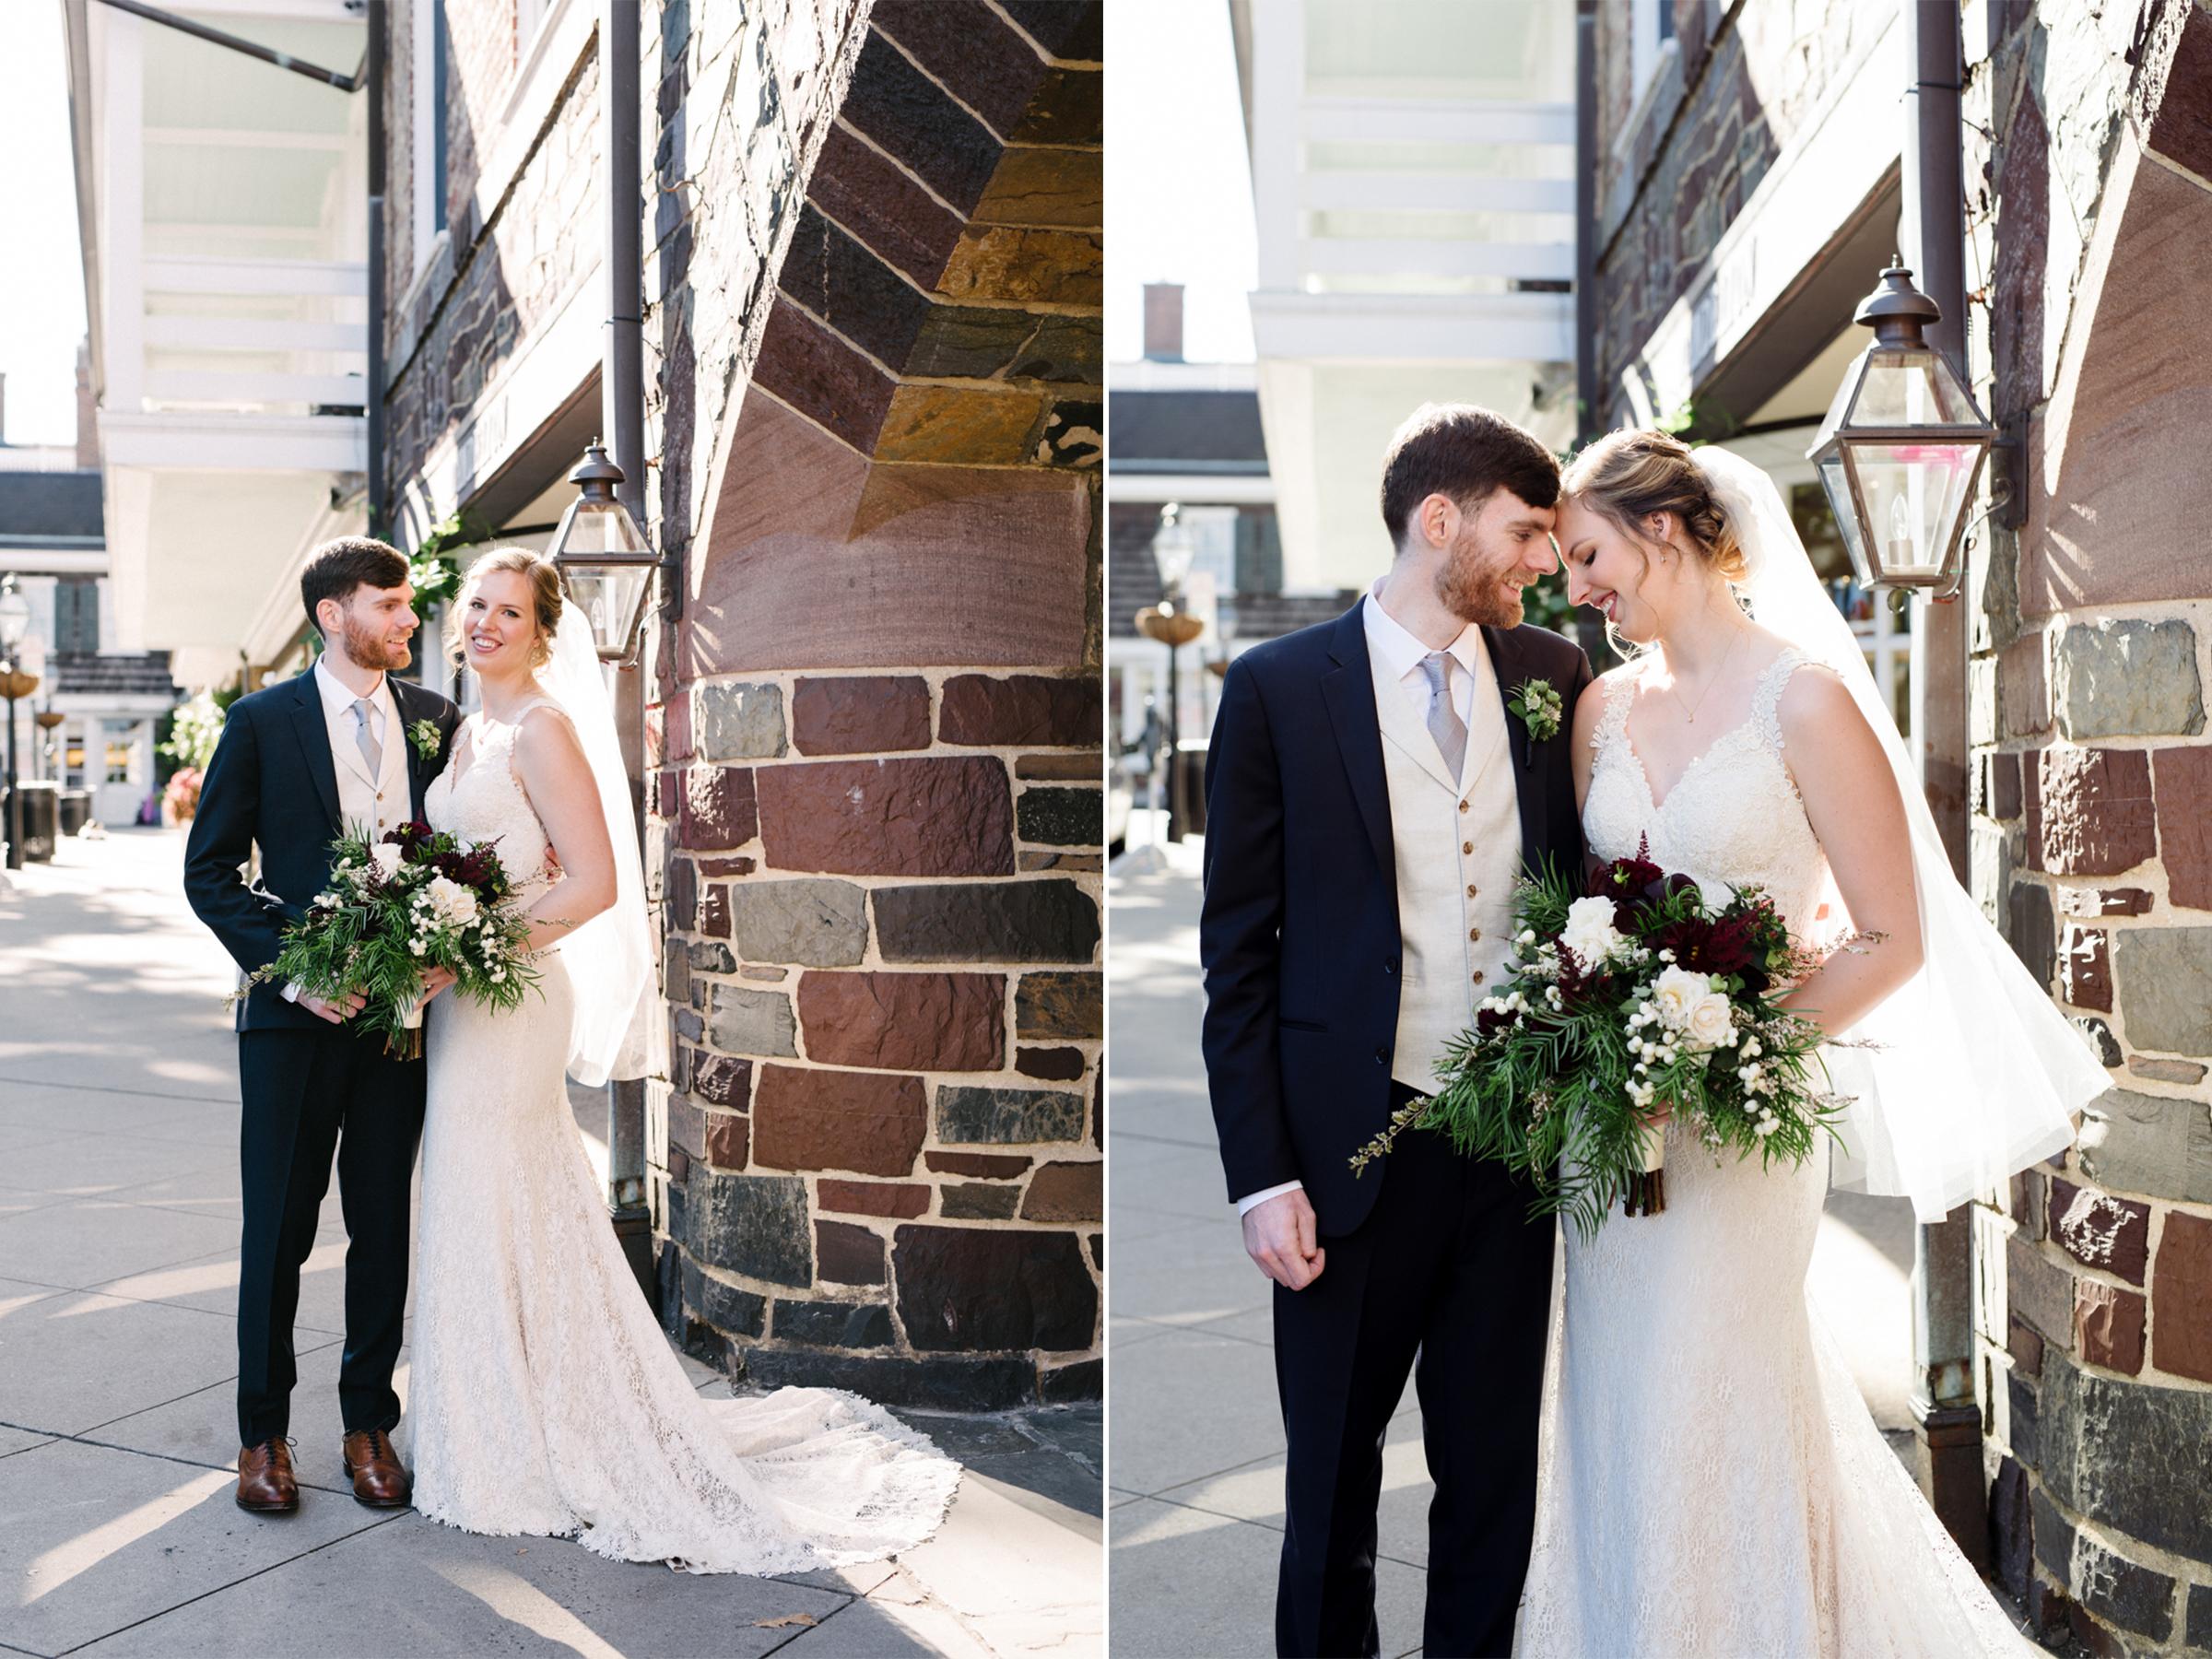 Chelsea+James- Bride and Groom Portraits- Nassau Inn Princeton Wedding- Olivia Christina Photo.jpg